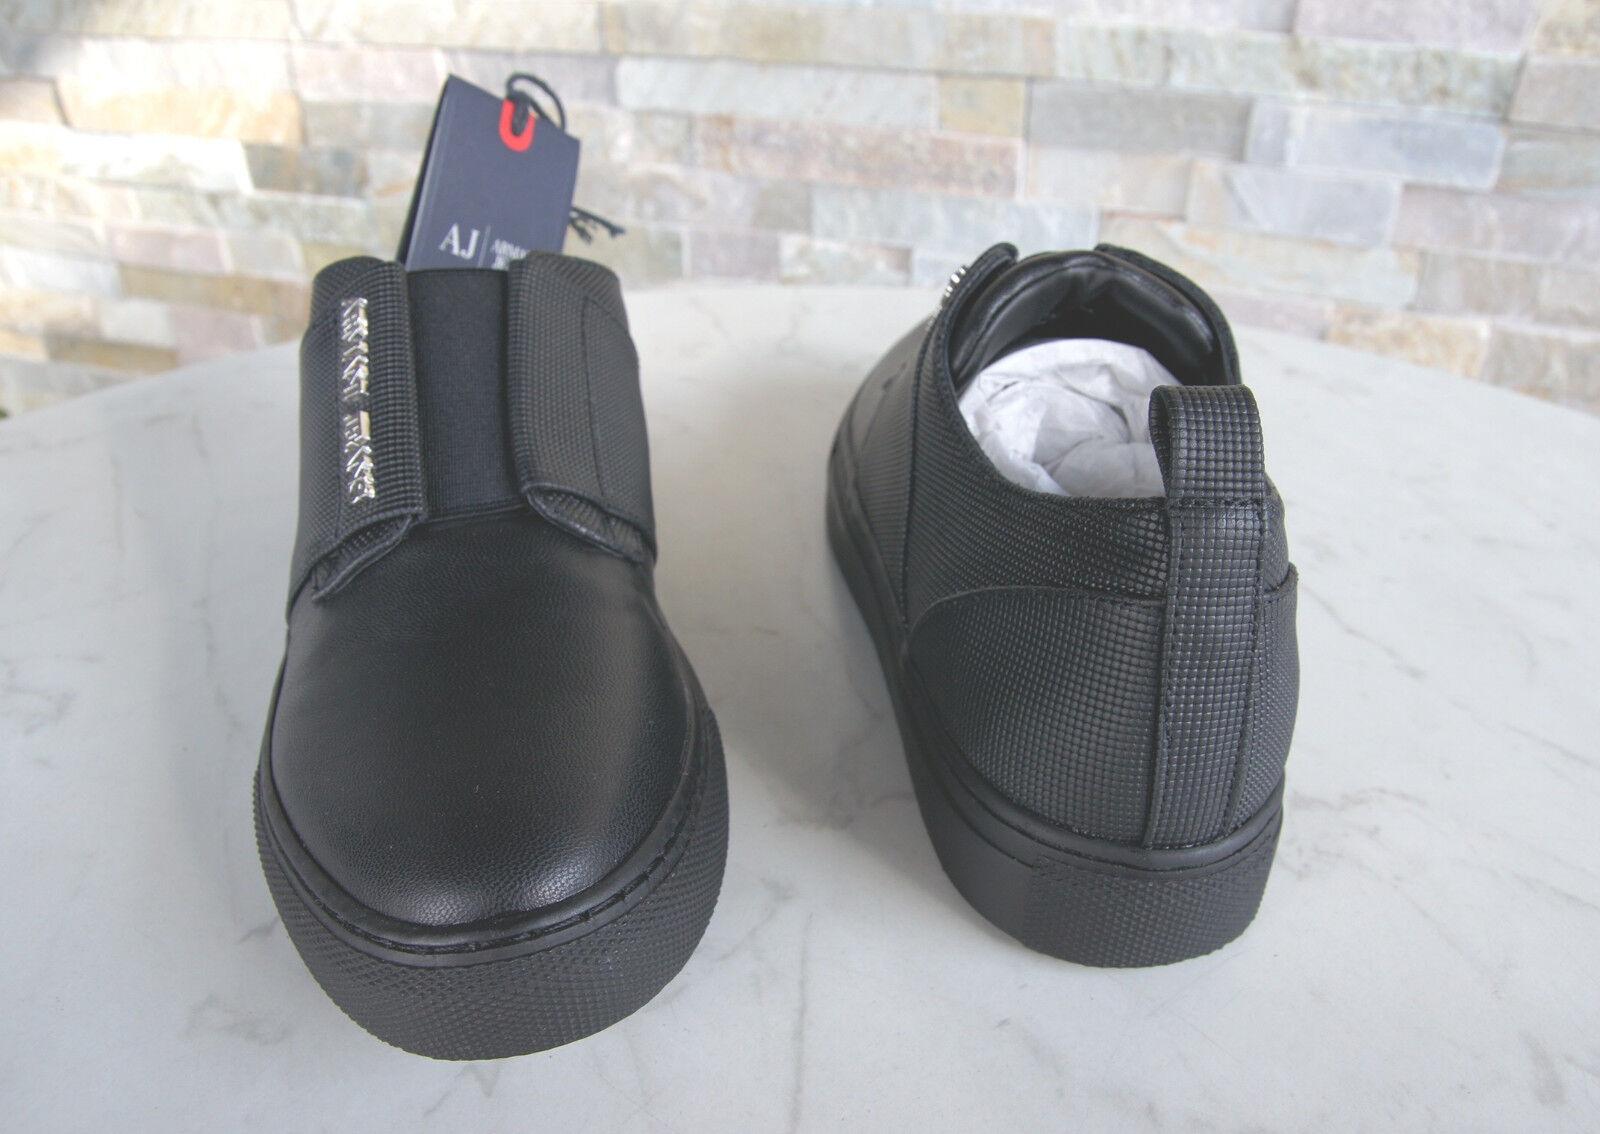 ARMANI JEANS Sneakers Gr 40 Slipper Slip-Ons Schuhe Schuhe Slip-Ons 6A518 schwarz NEU 31d2aa